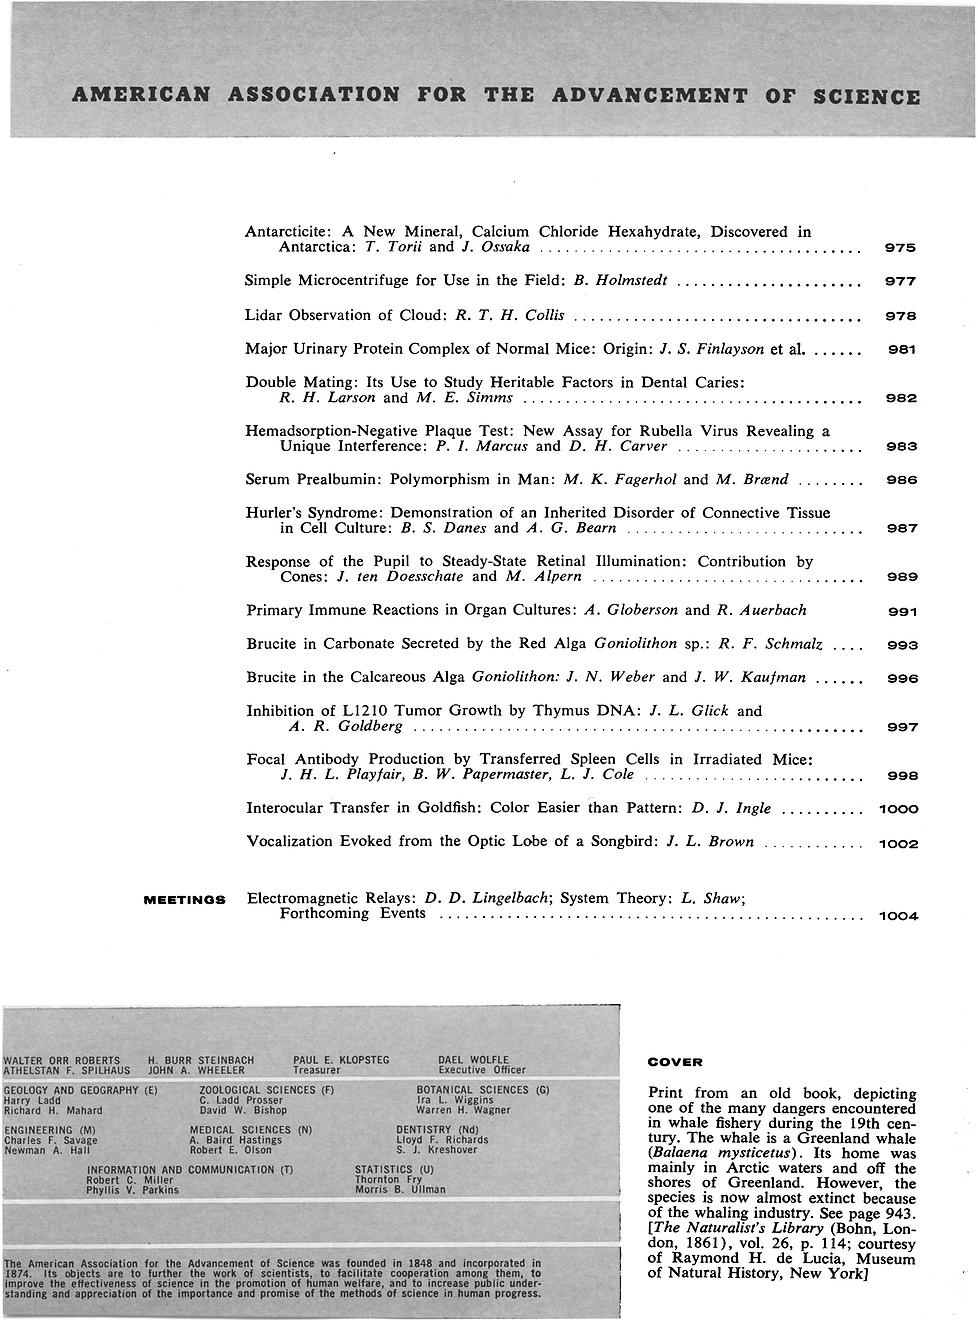 3687.toc.pdf - Copycvb.tiff